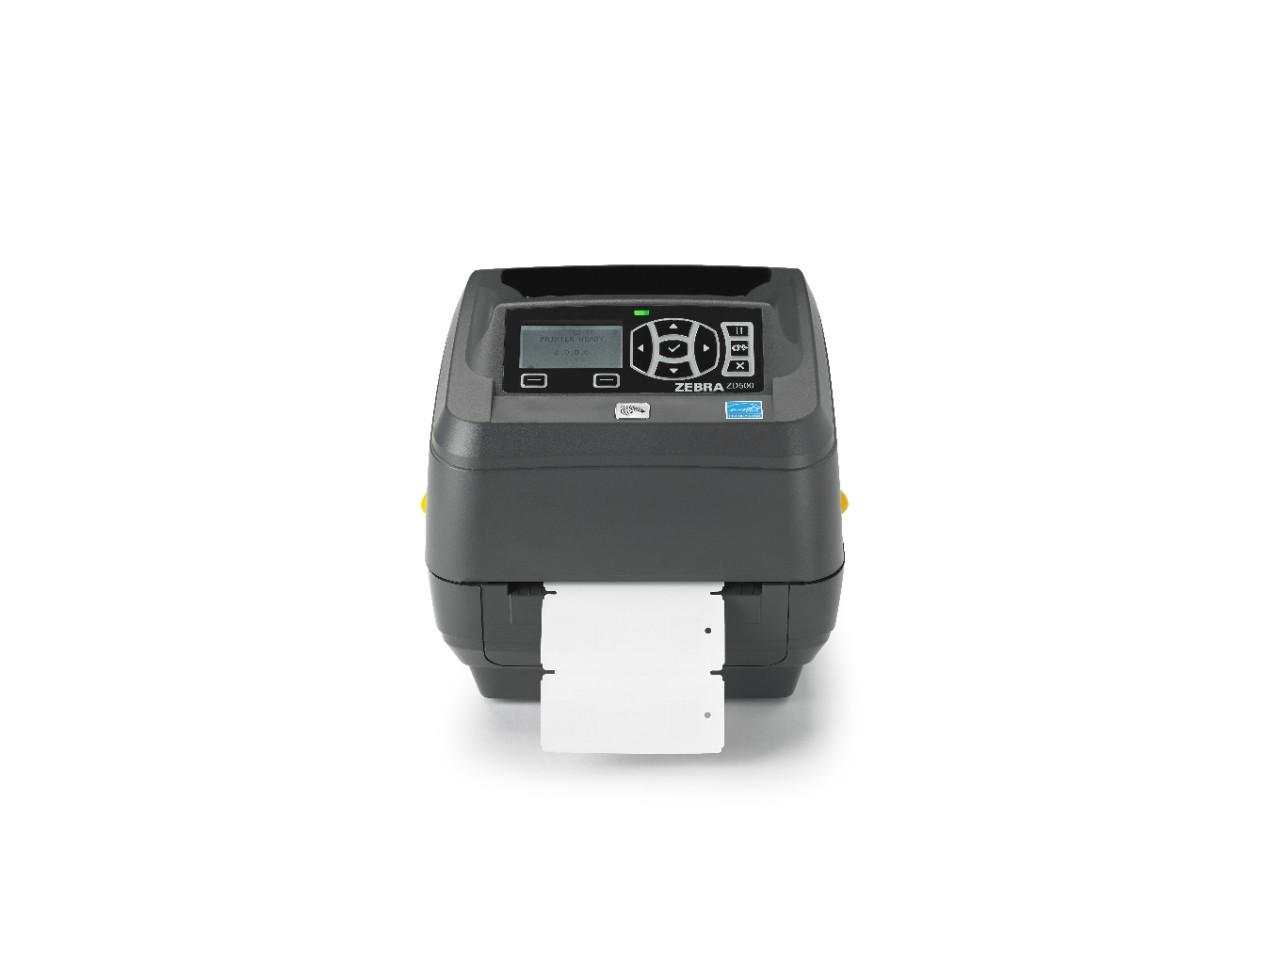 imprimante etiquette zebra zd500